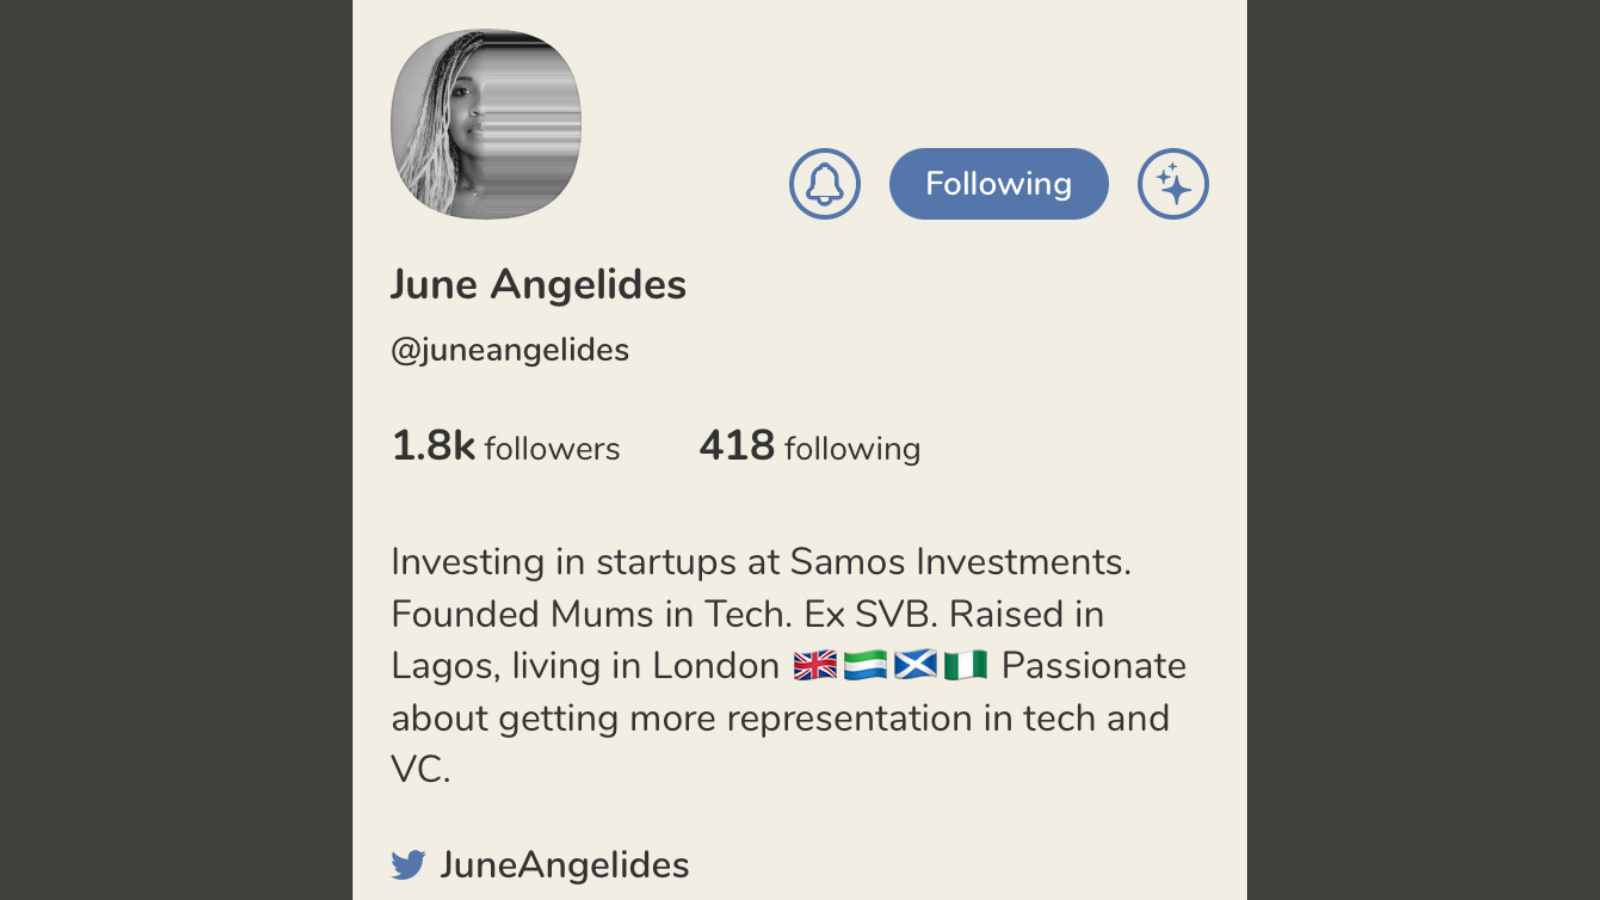 June Angelides